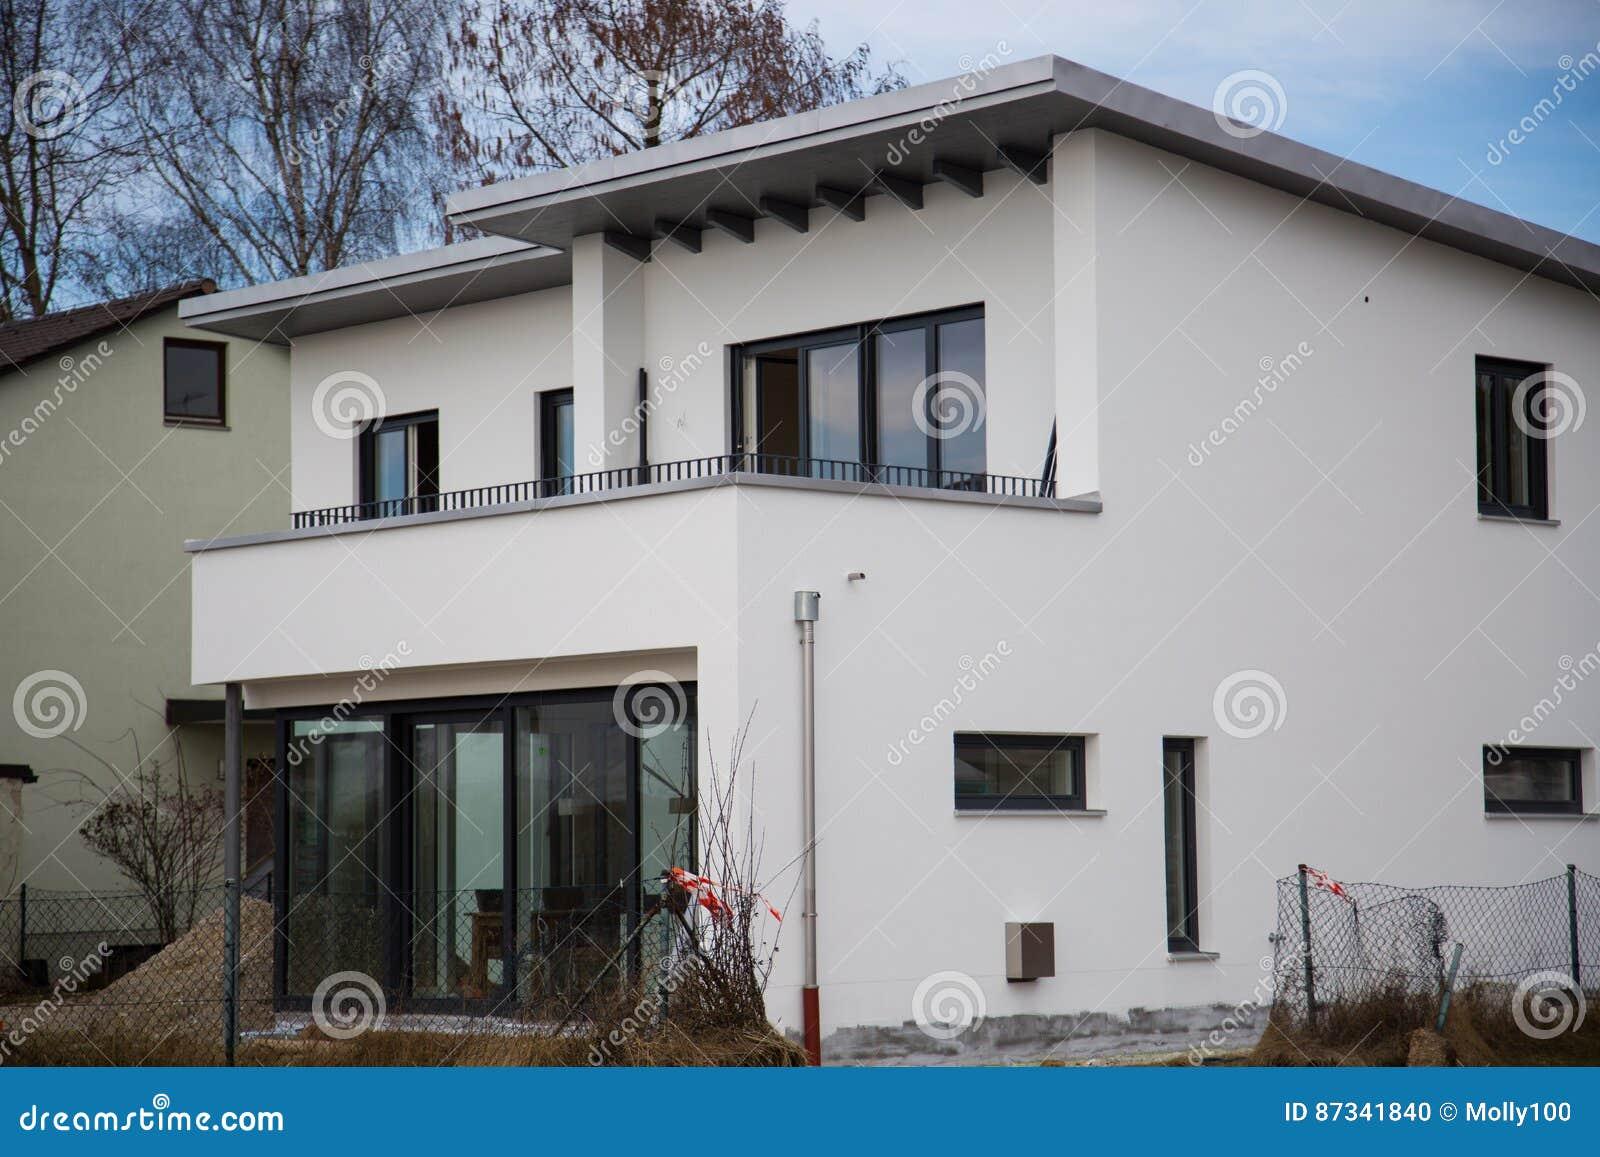 Modern ééngezinshuis, vlak dak